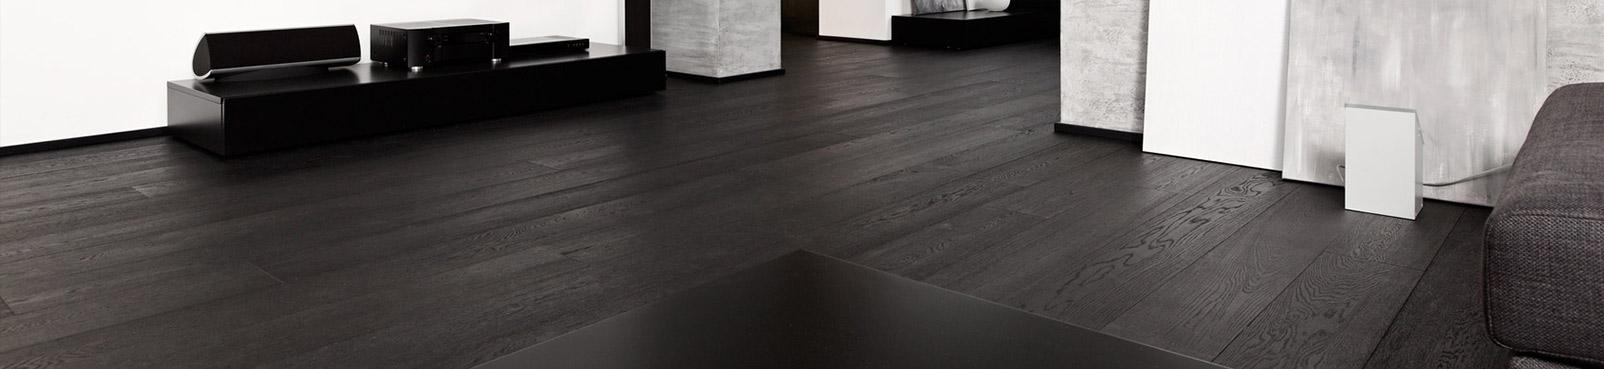 Hardwood Flooring Toronto Quot Clearance Quot Warehouse Engineered